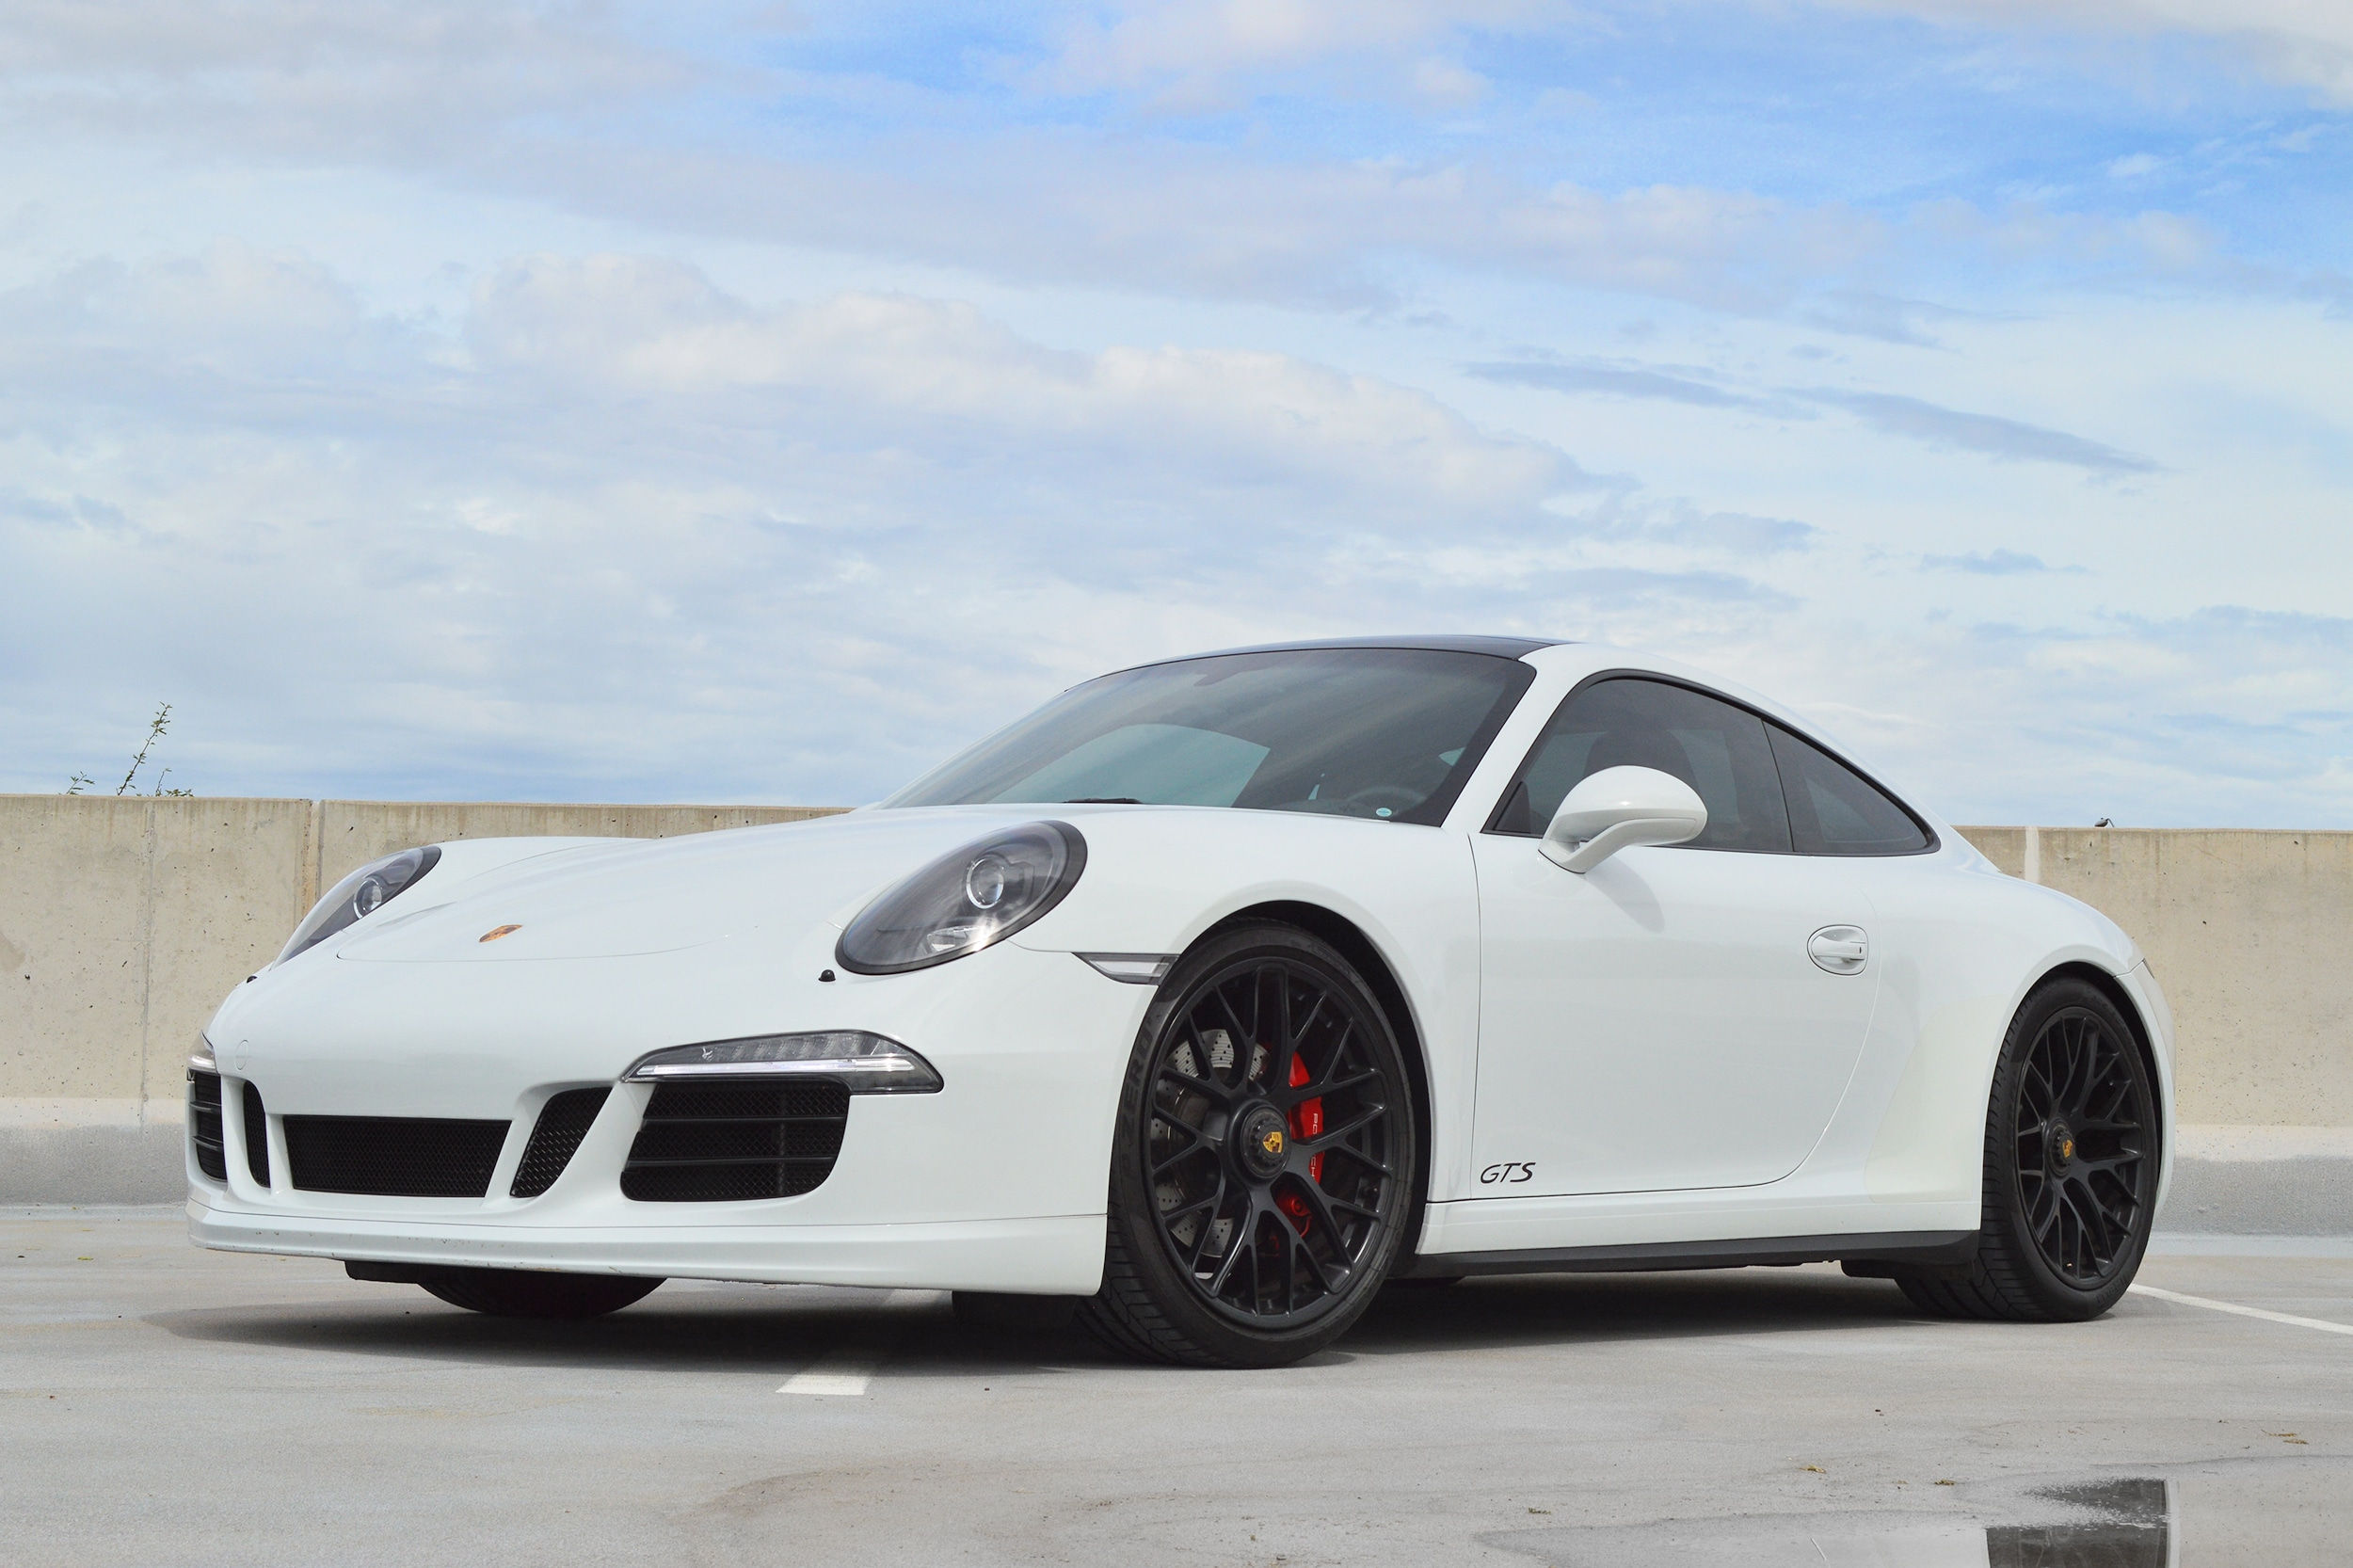 2015 Porsche 911 Carrera GTS Coupe